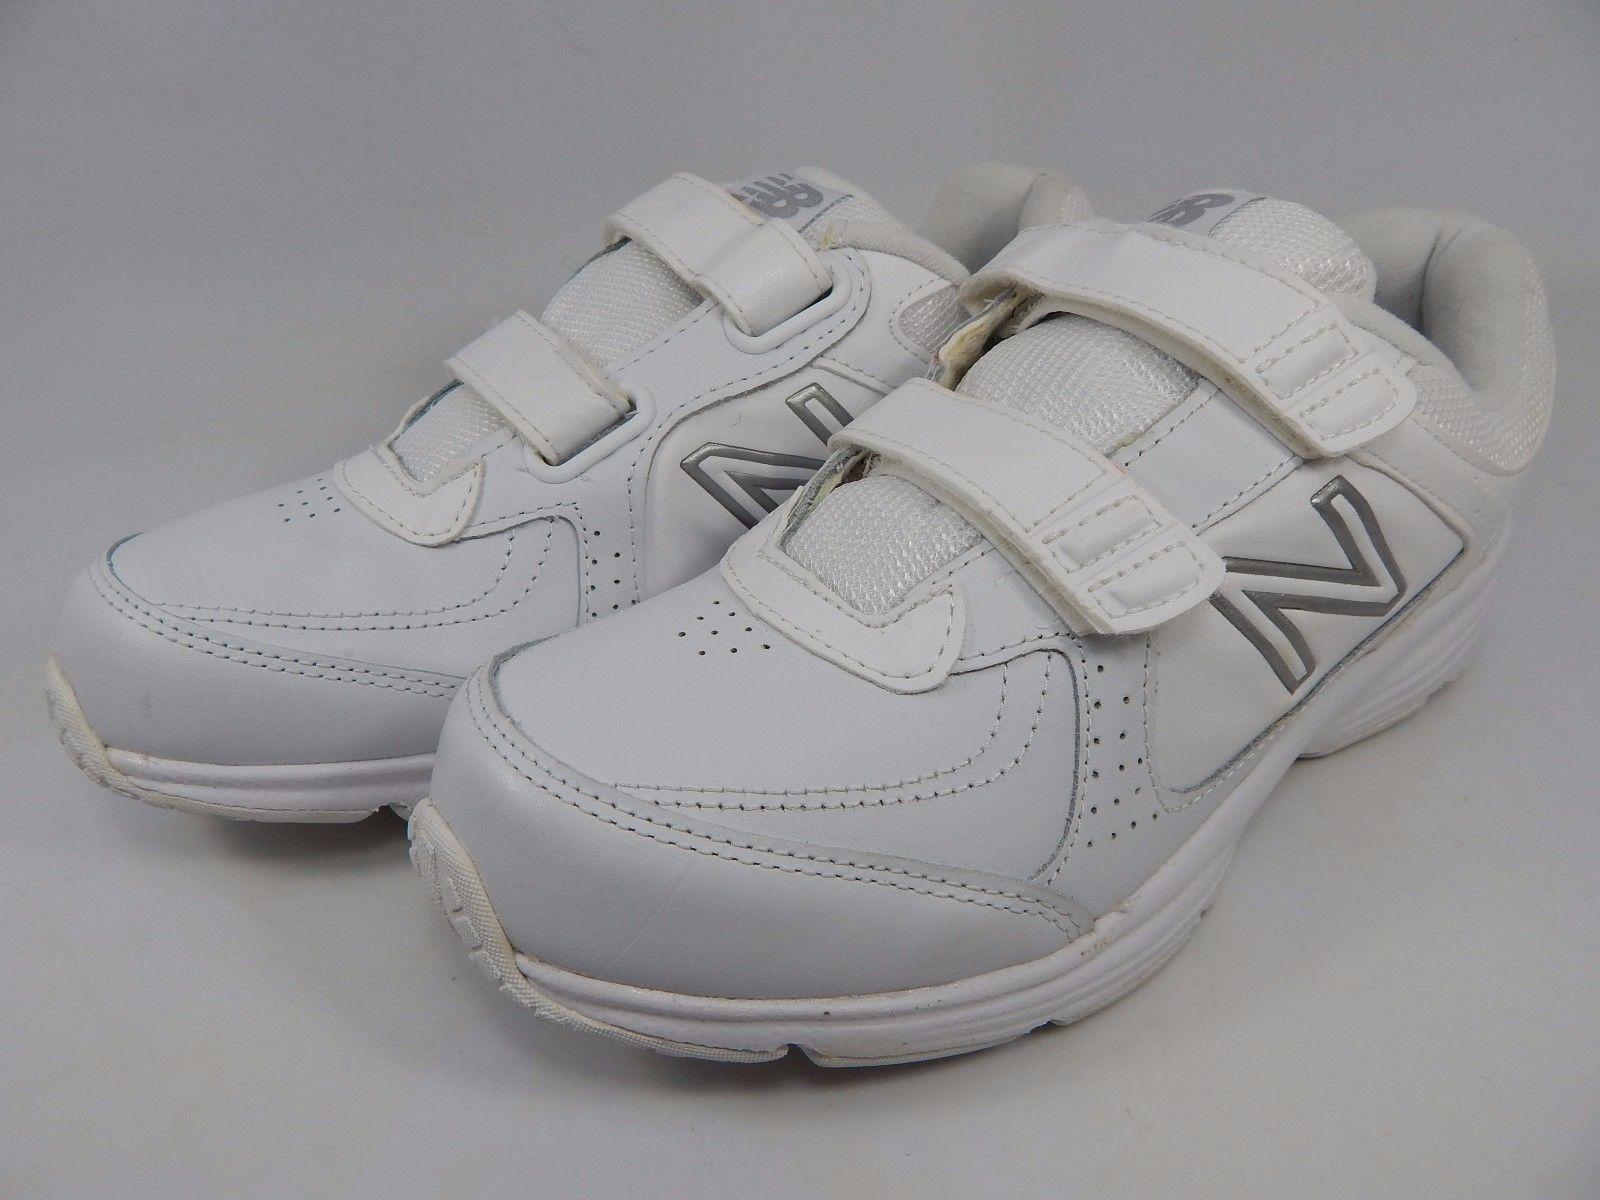 New Balance 411 Women's Walking Shoes Size US 8 D WIDE EU 39 White WW411HWT